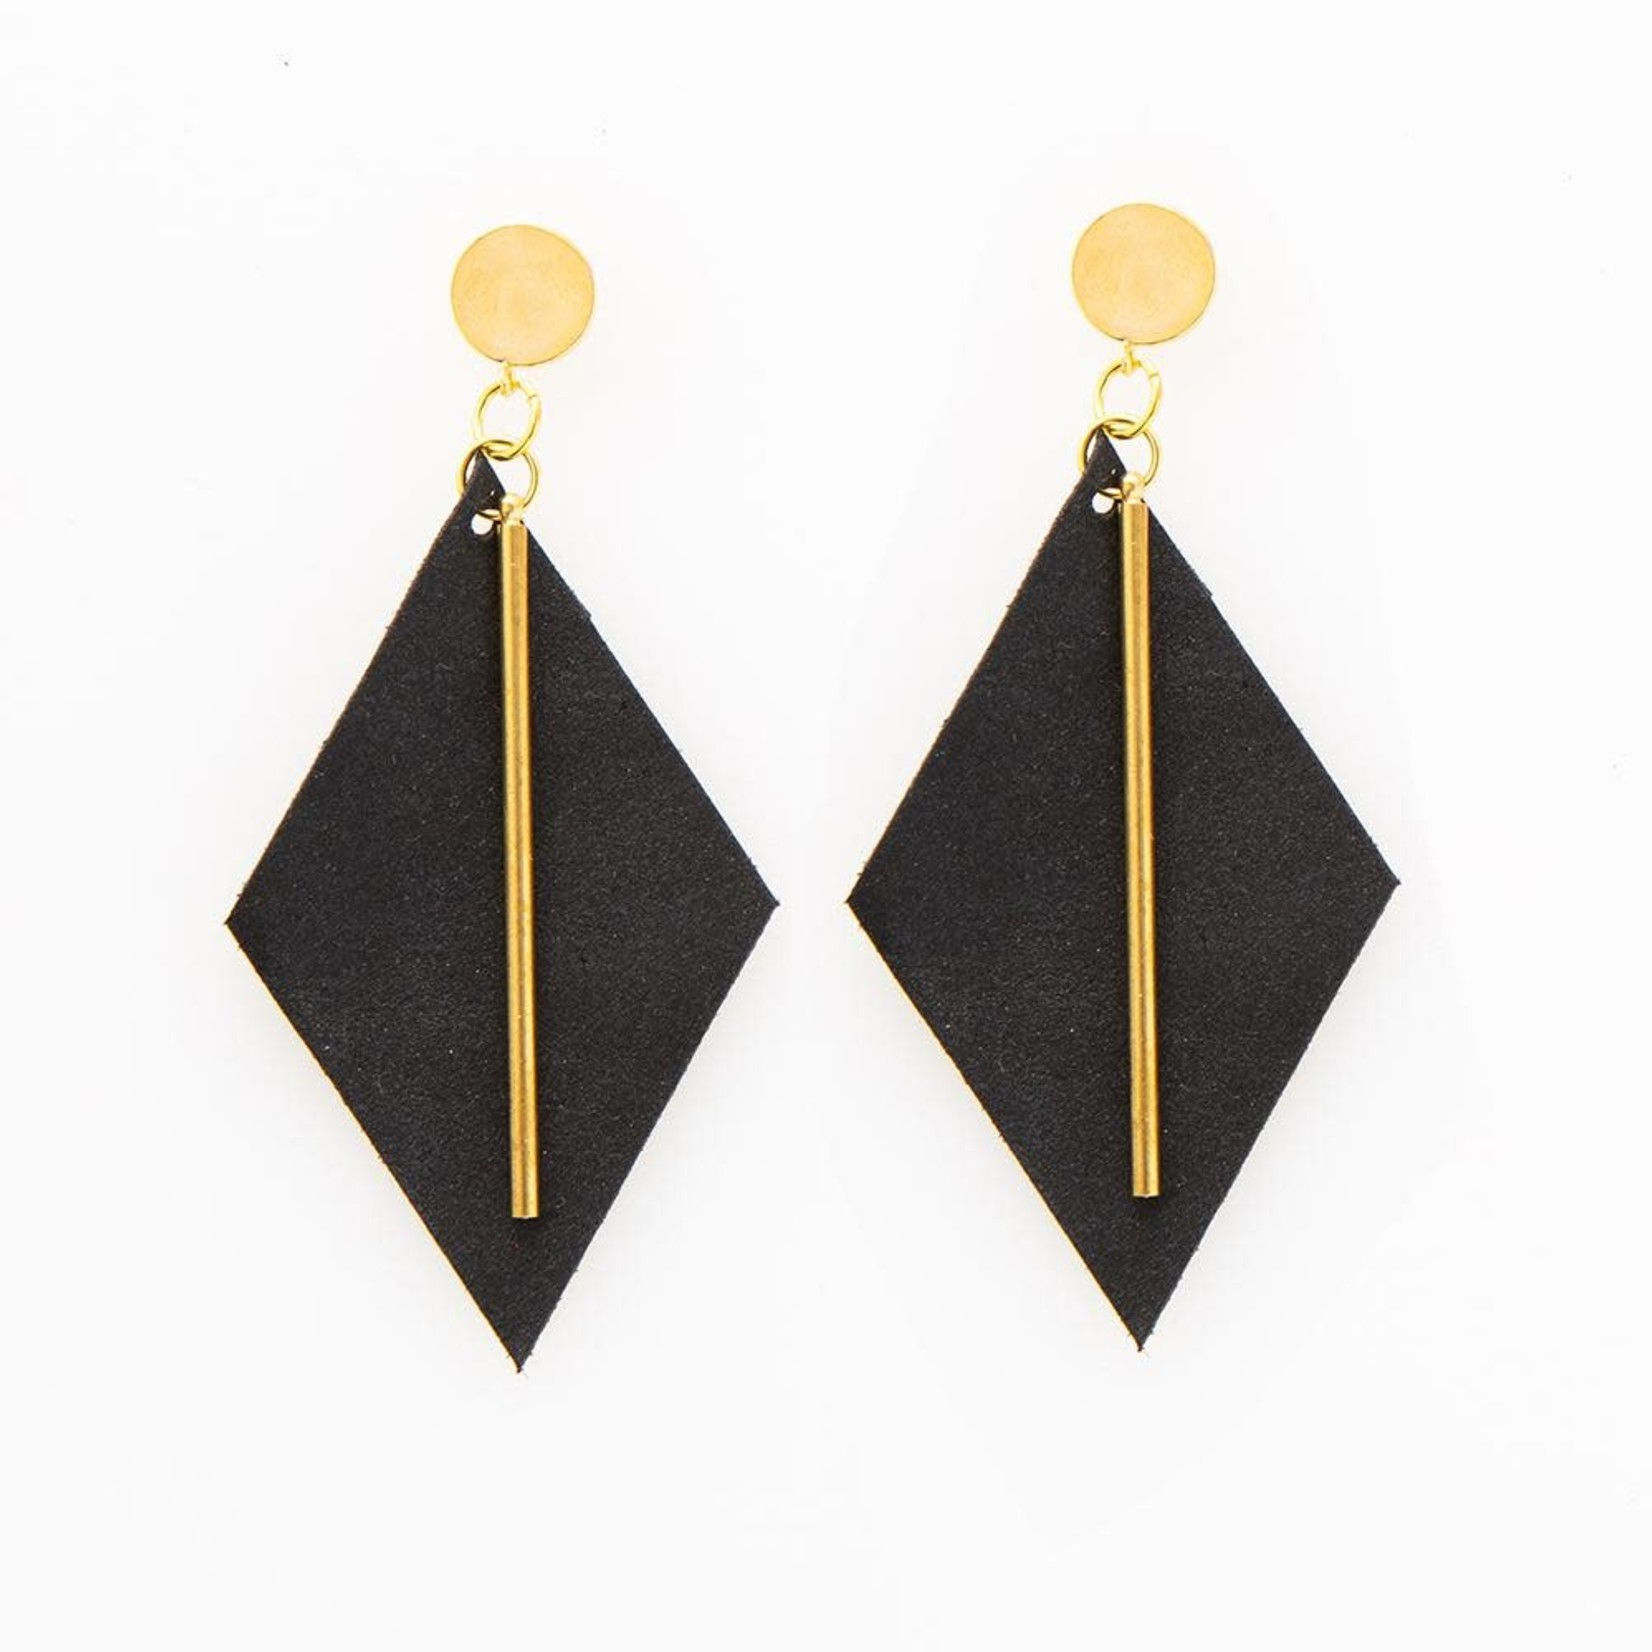 INK + ALLOY Black Diamond Leather Earring